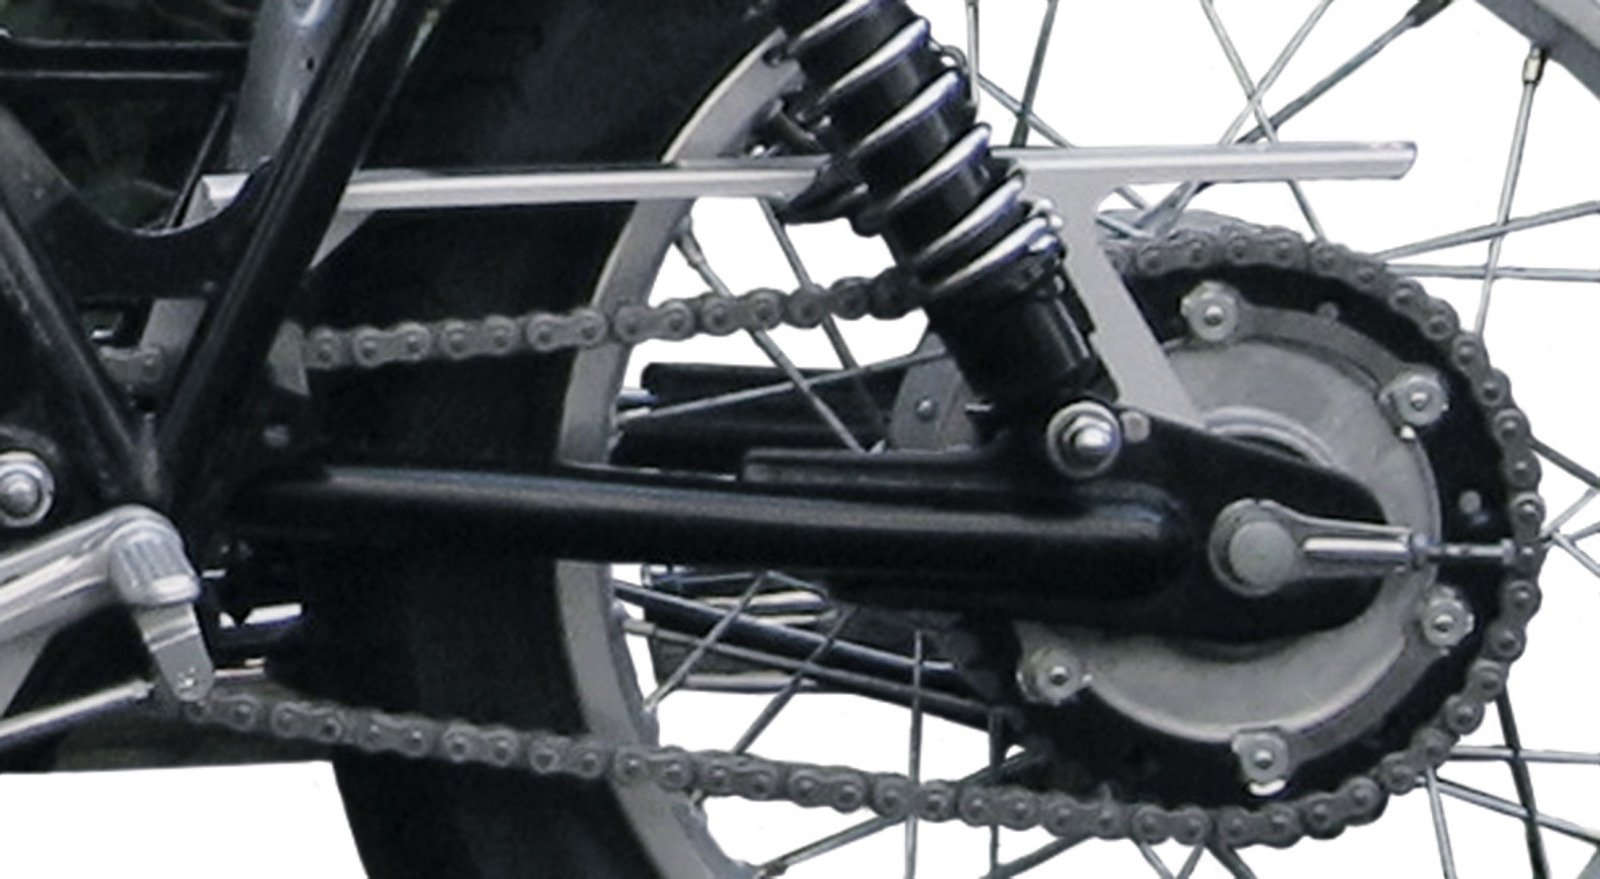 Yamaha SR400 & SR500 Mini-Chainguard Matt Black w/ Mounting Hardware 30961S